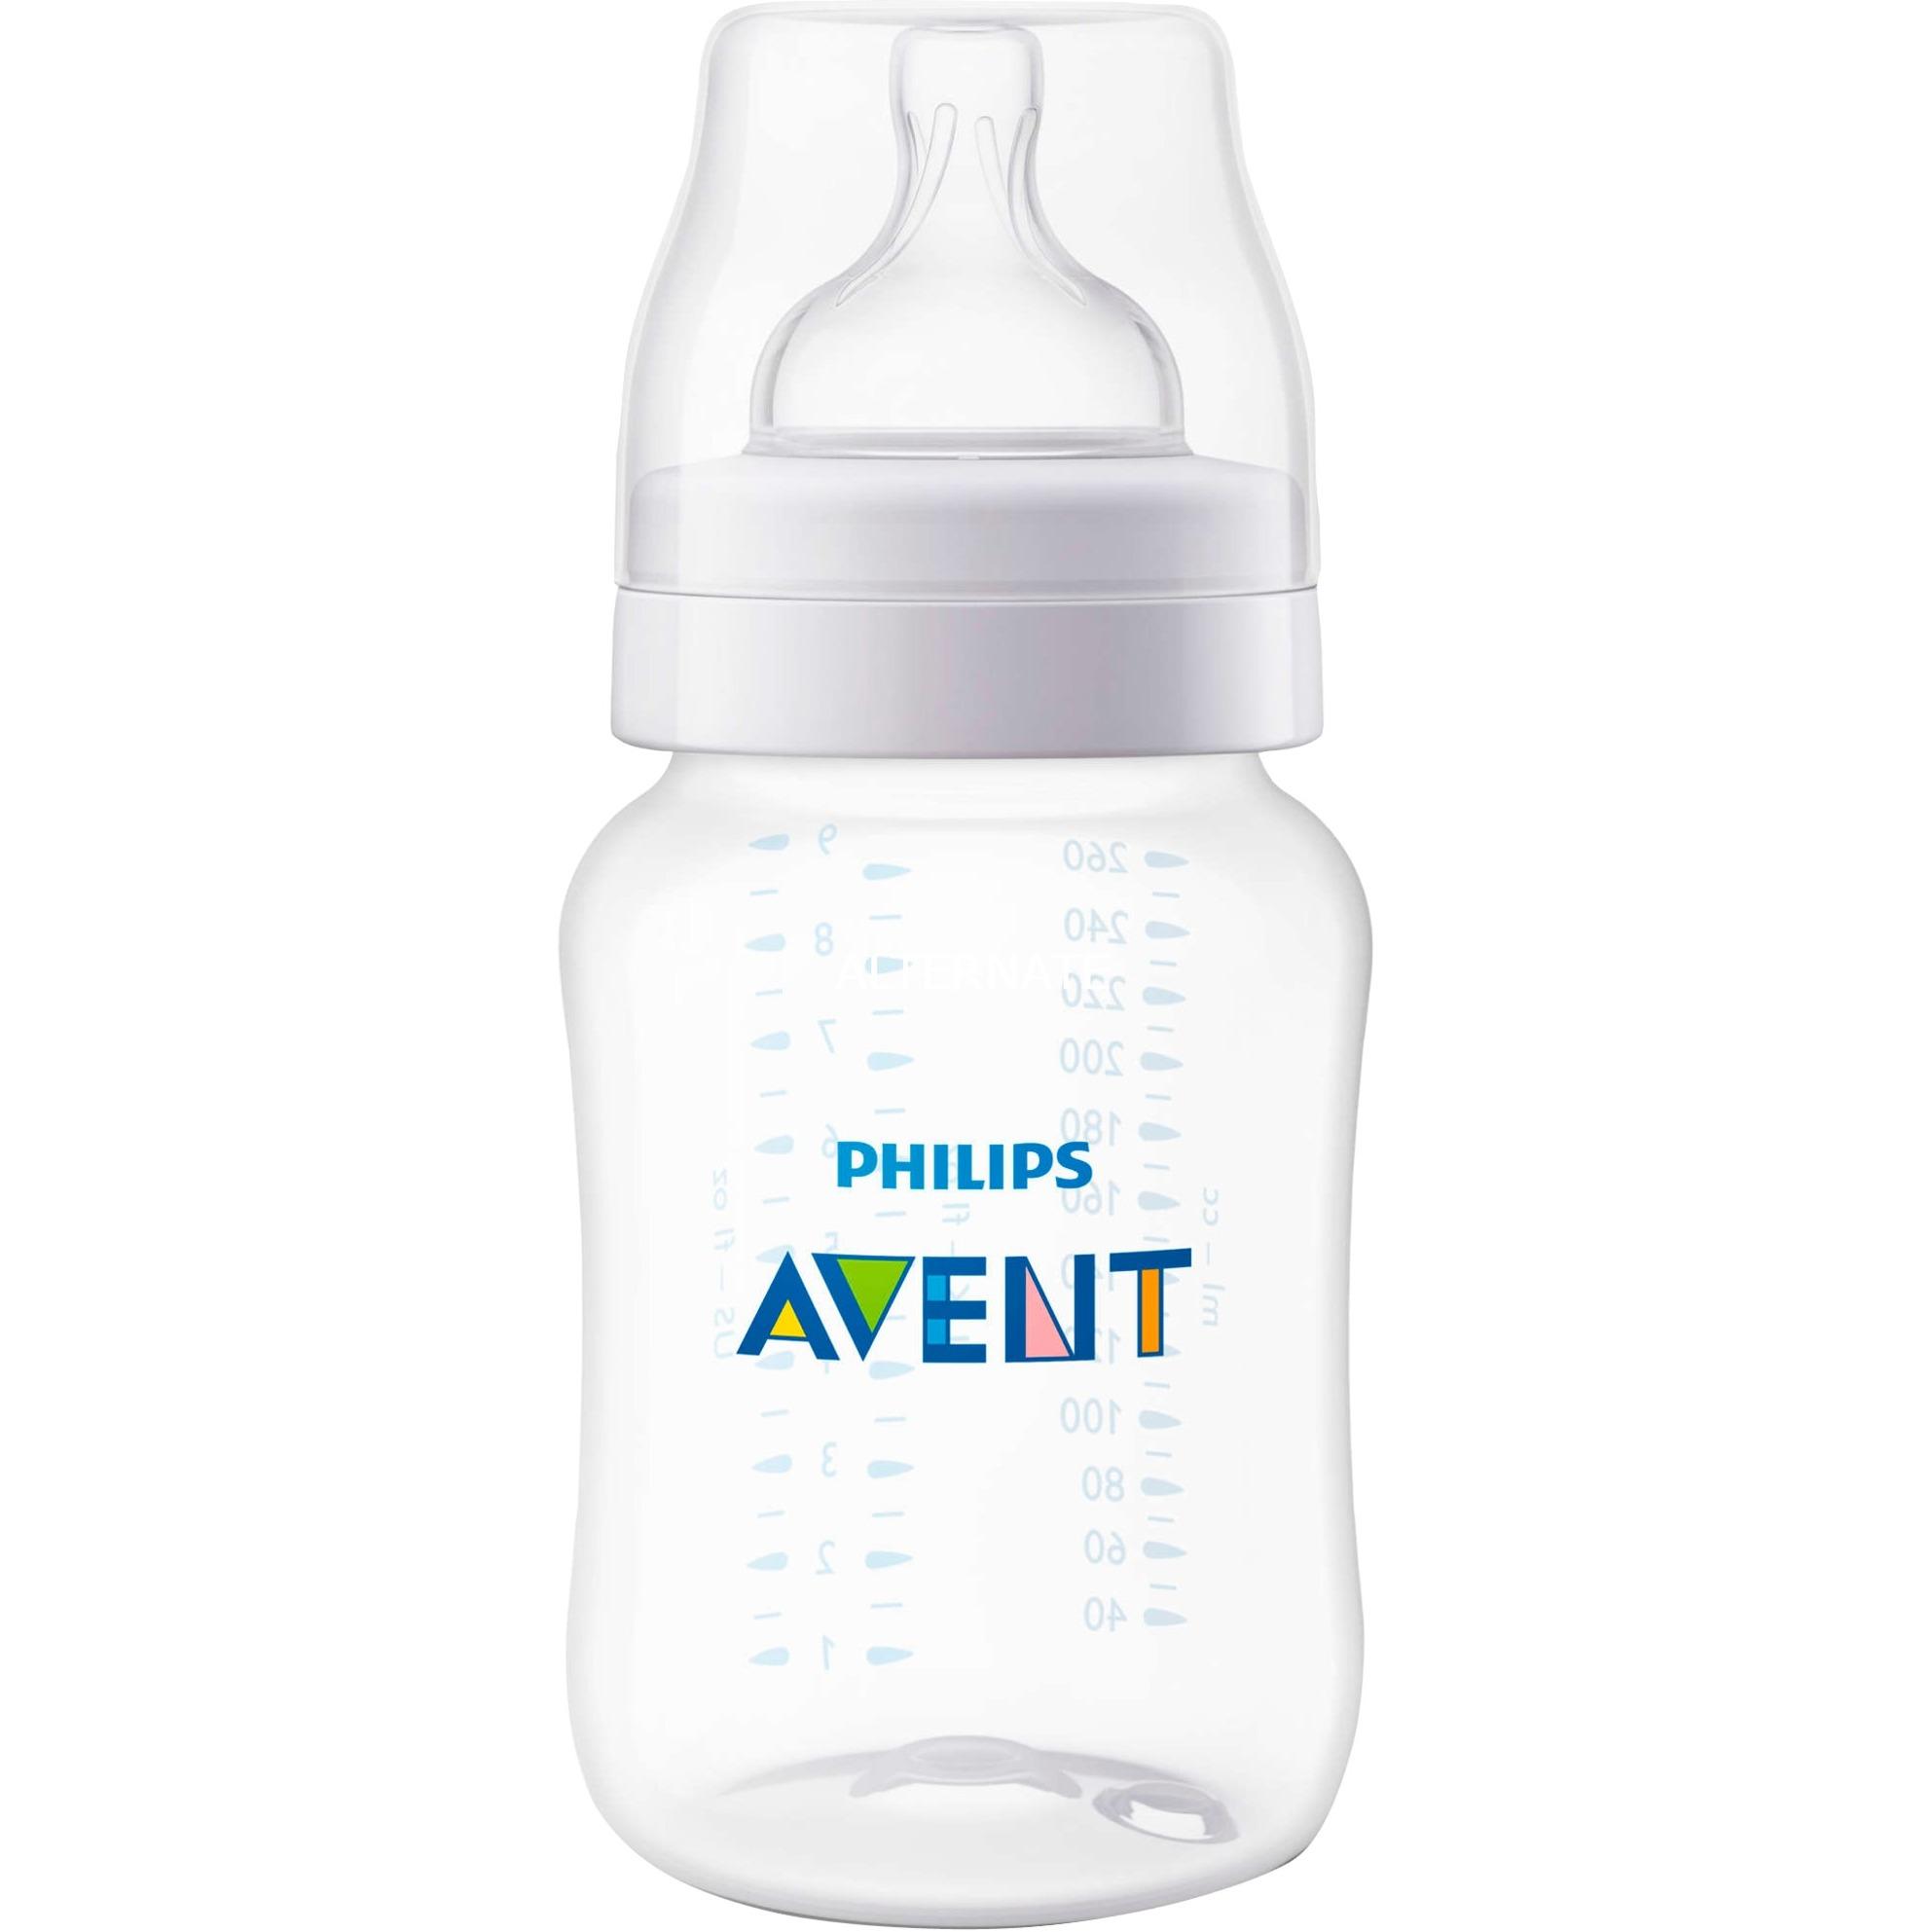 SCF563/27 260ml Polipropileno (PP) Transparente, Blanco biberón, Botella de bebé